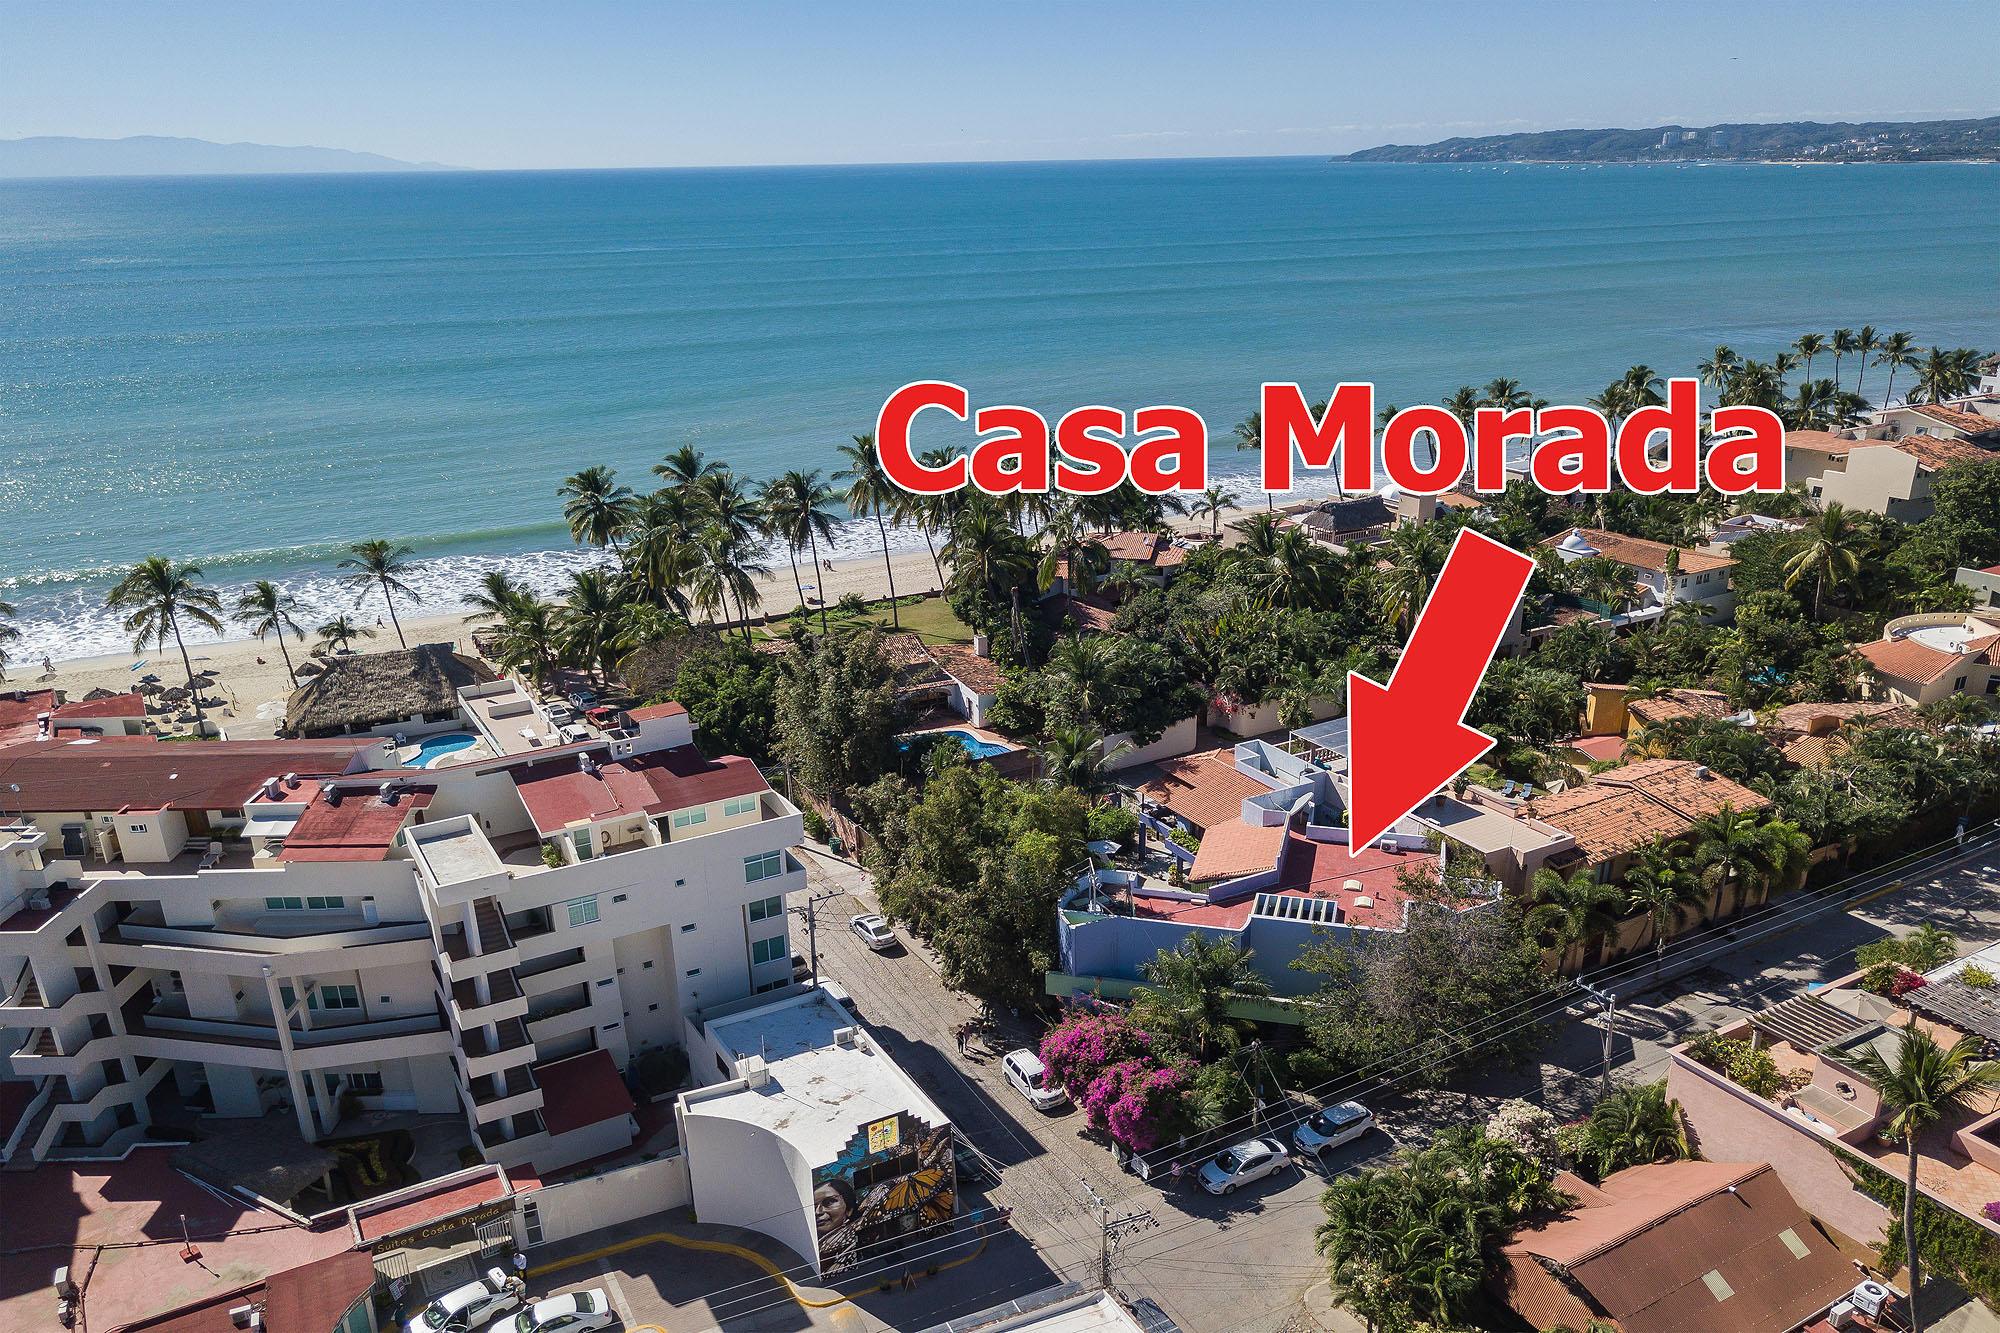 2-A LAZARO CARDENAS, CASA MORADA, Riviera Nayarit, NA